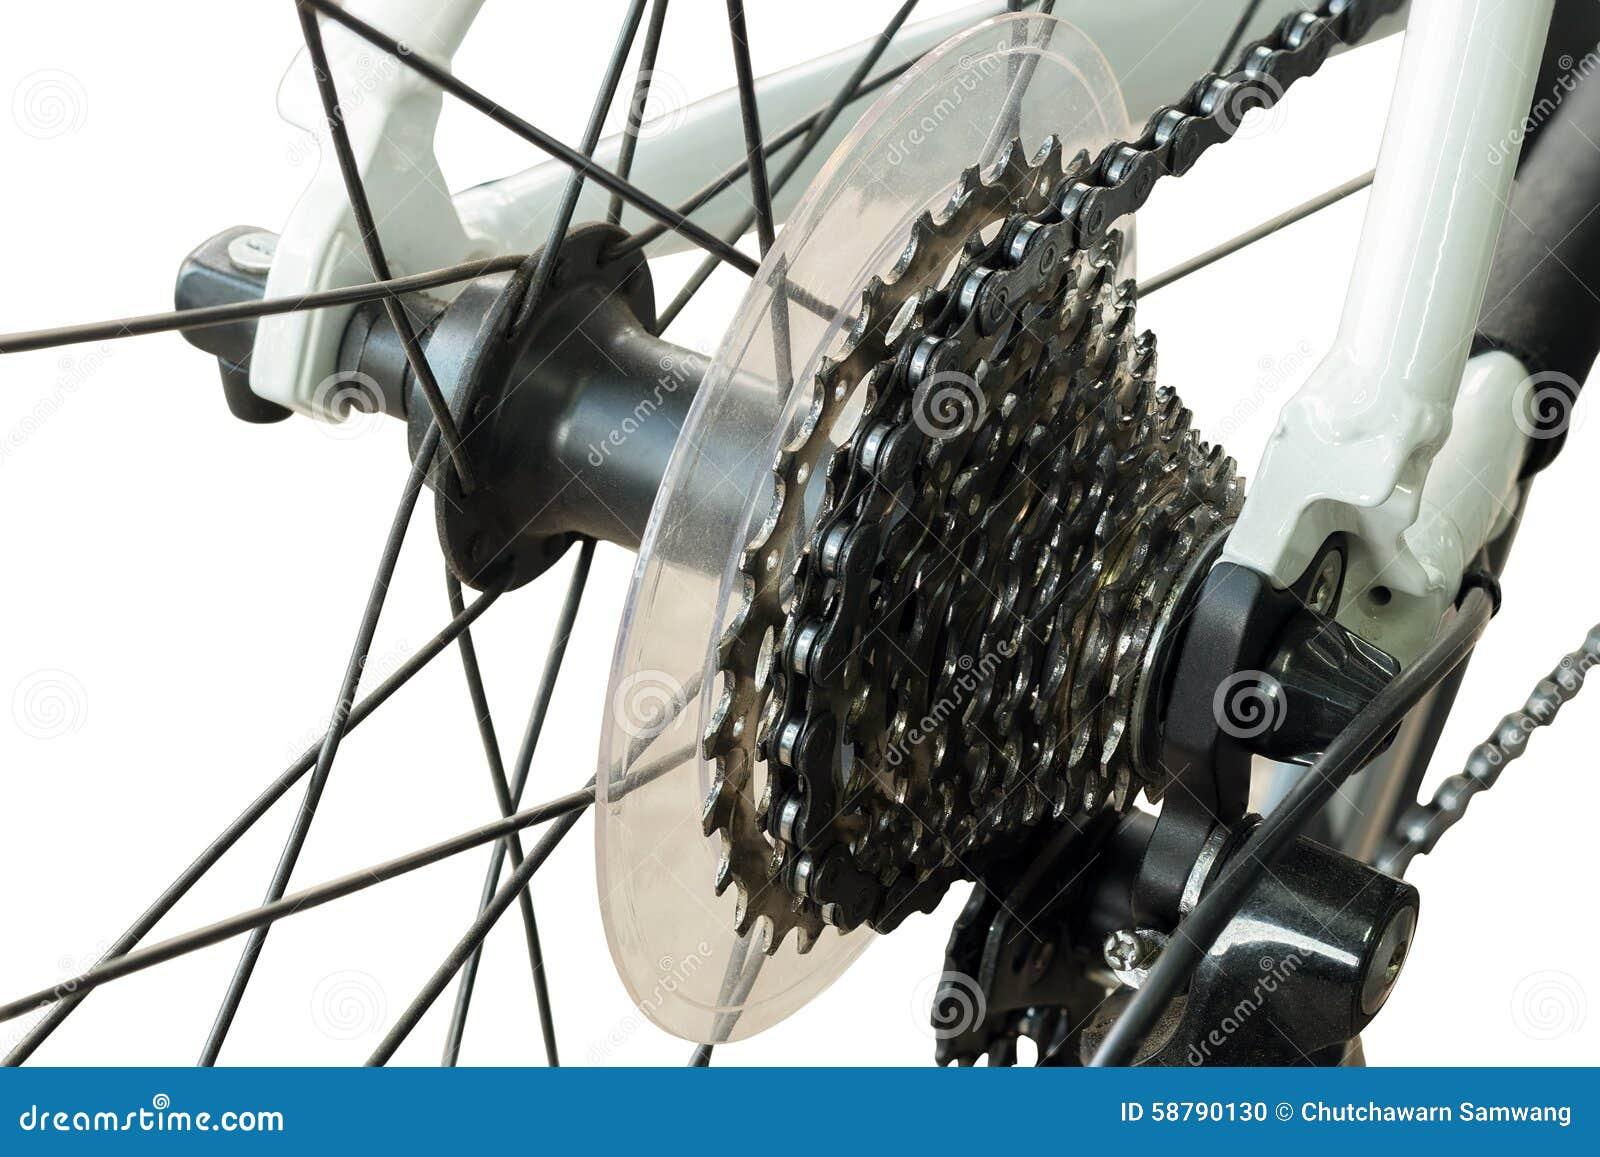 Rear Mountain Bike Cassette On The Wheel Stock Photo Image 58790130